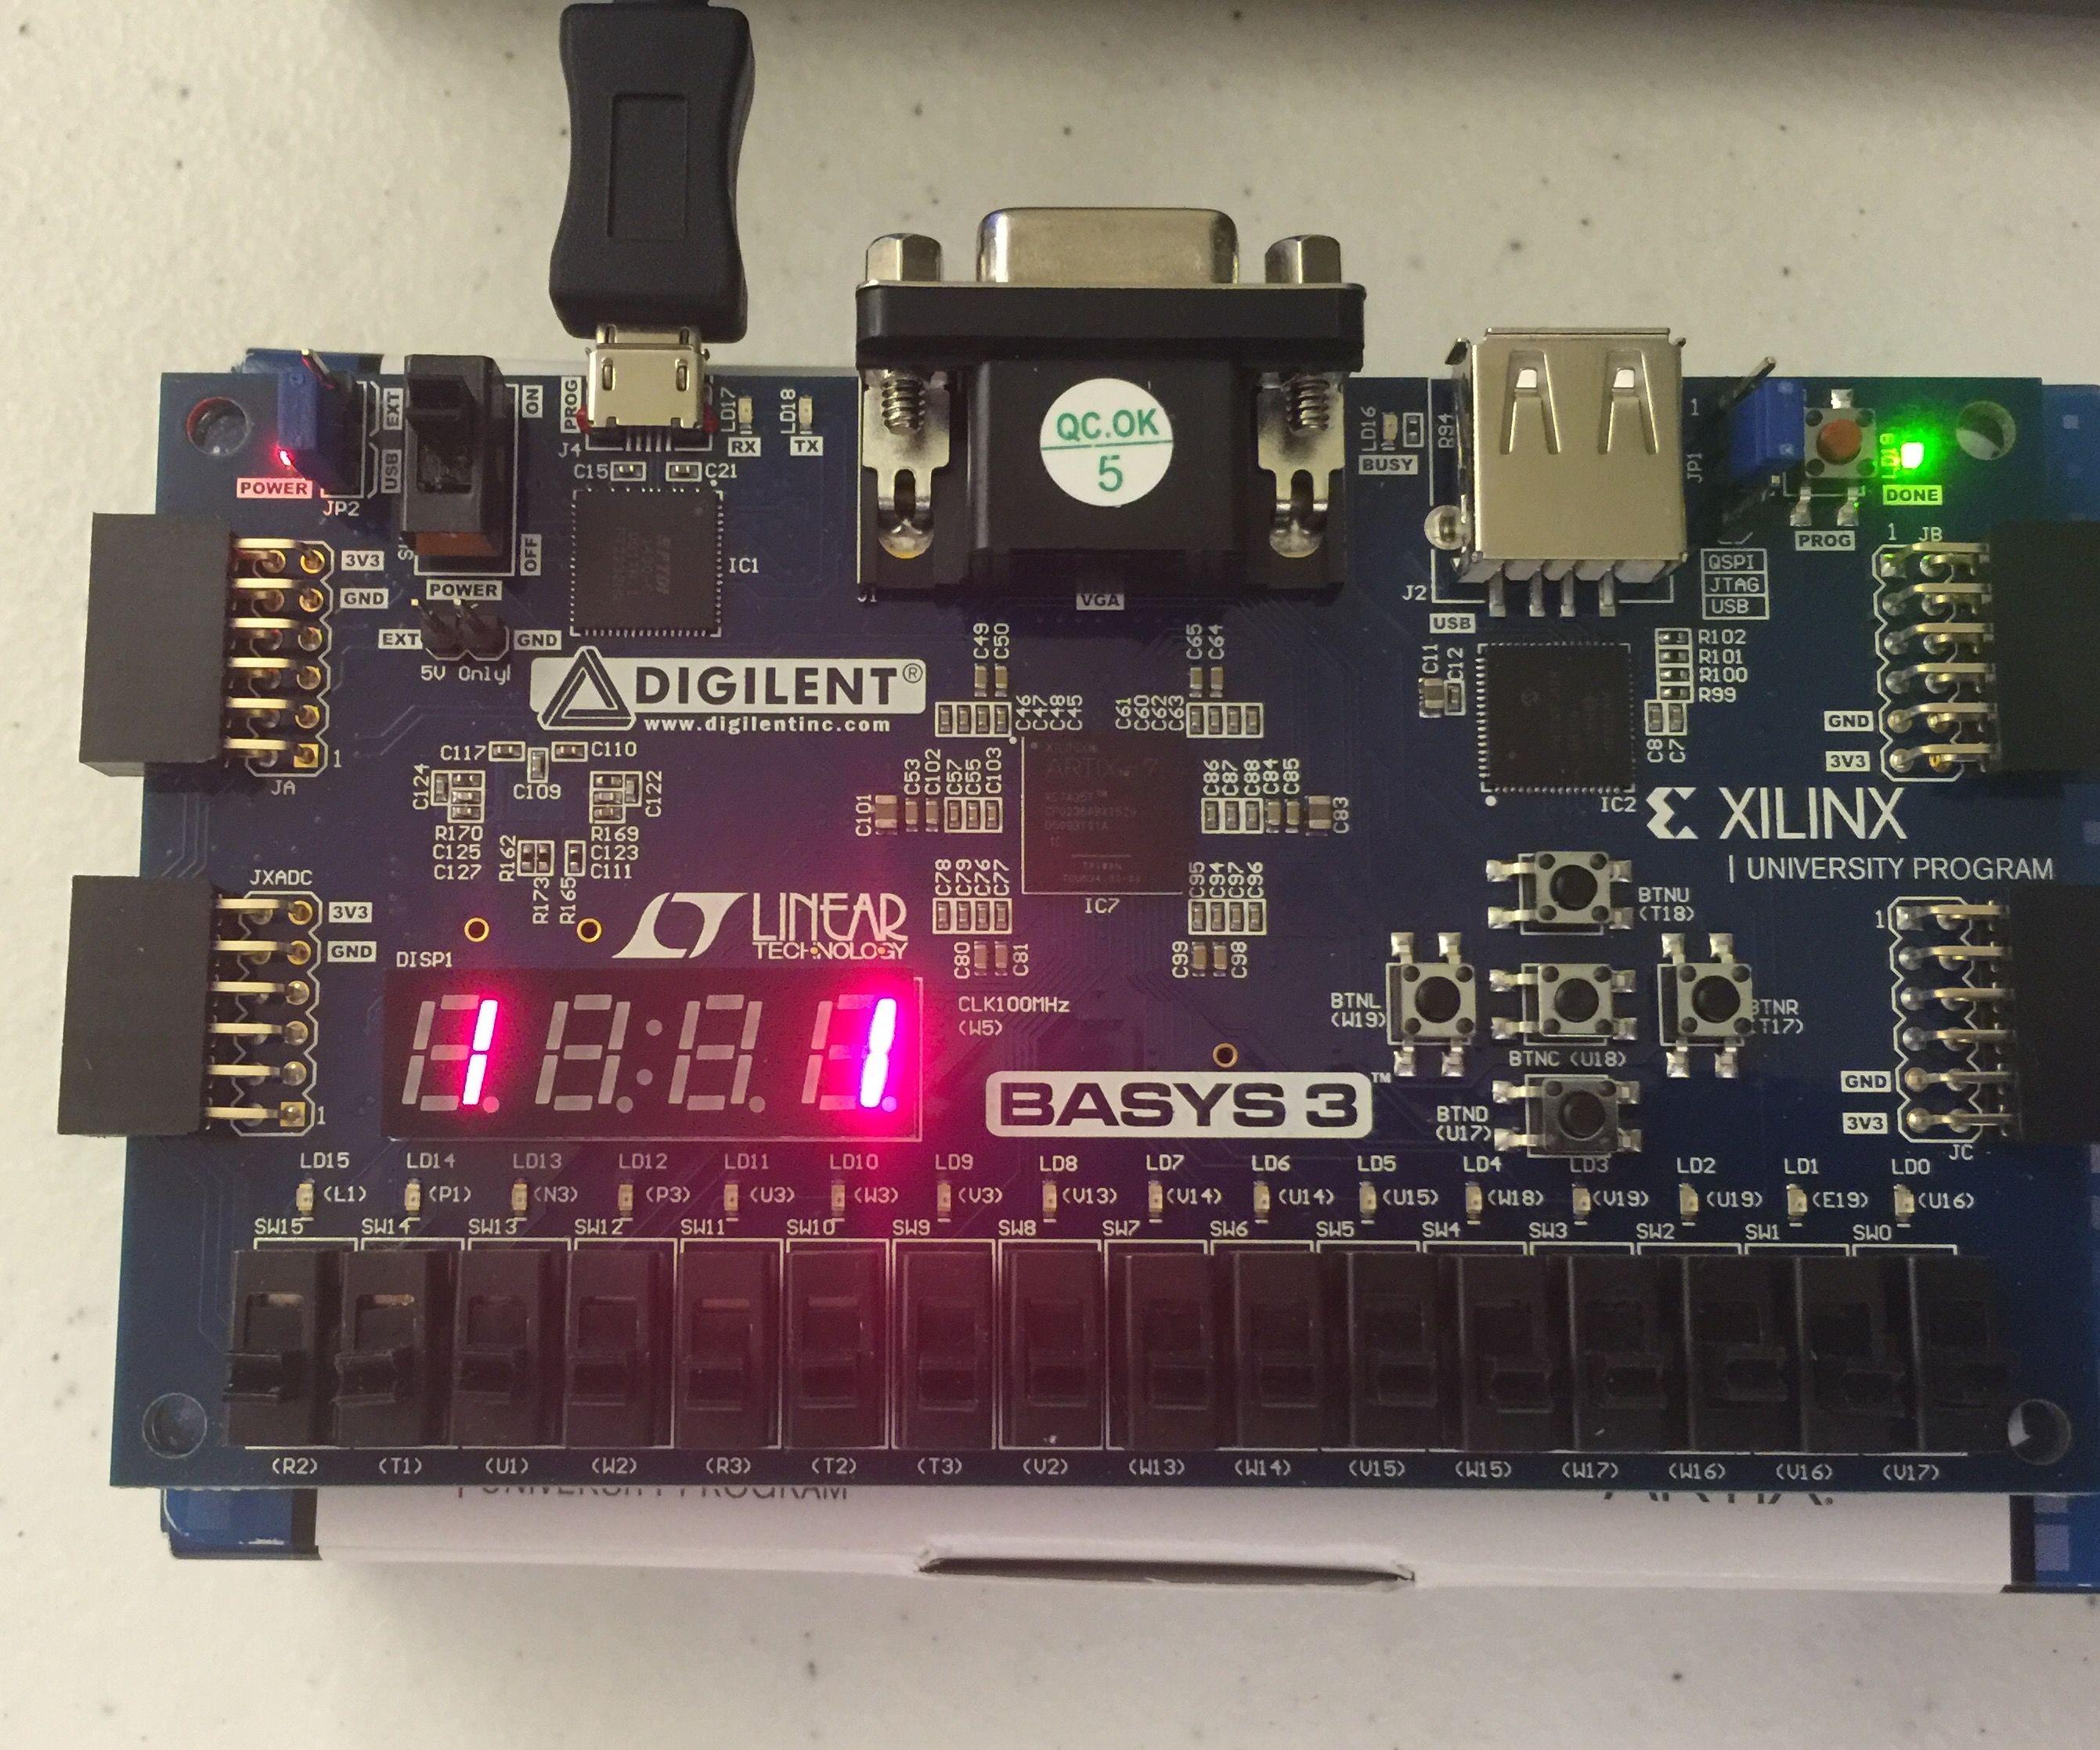 Sequence Detector Using Digilent Basys 3 FPGA Board: 10 Steps